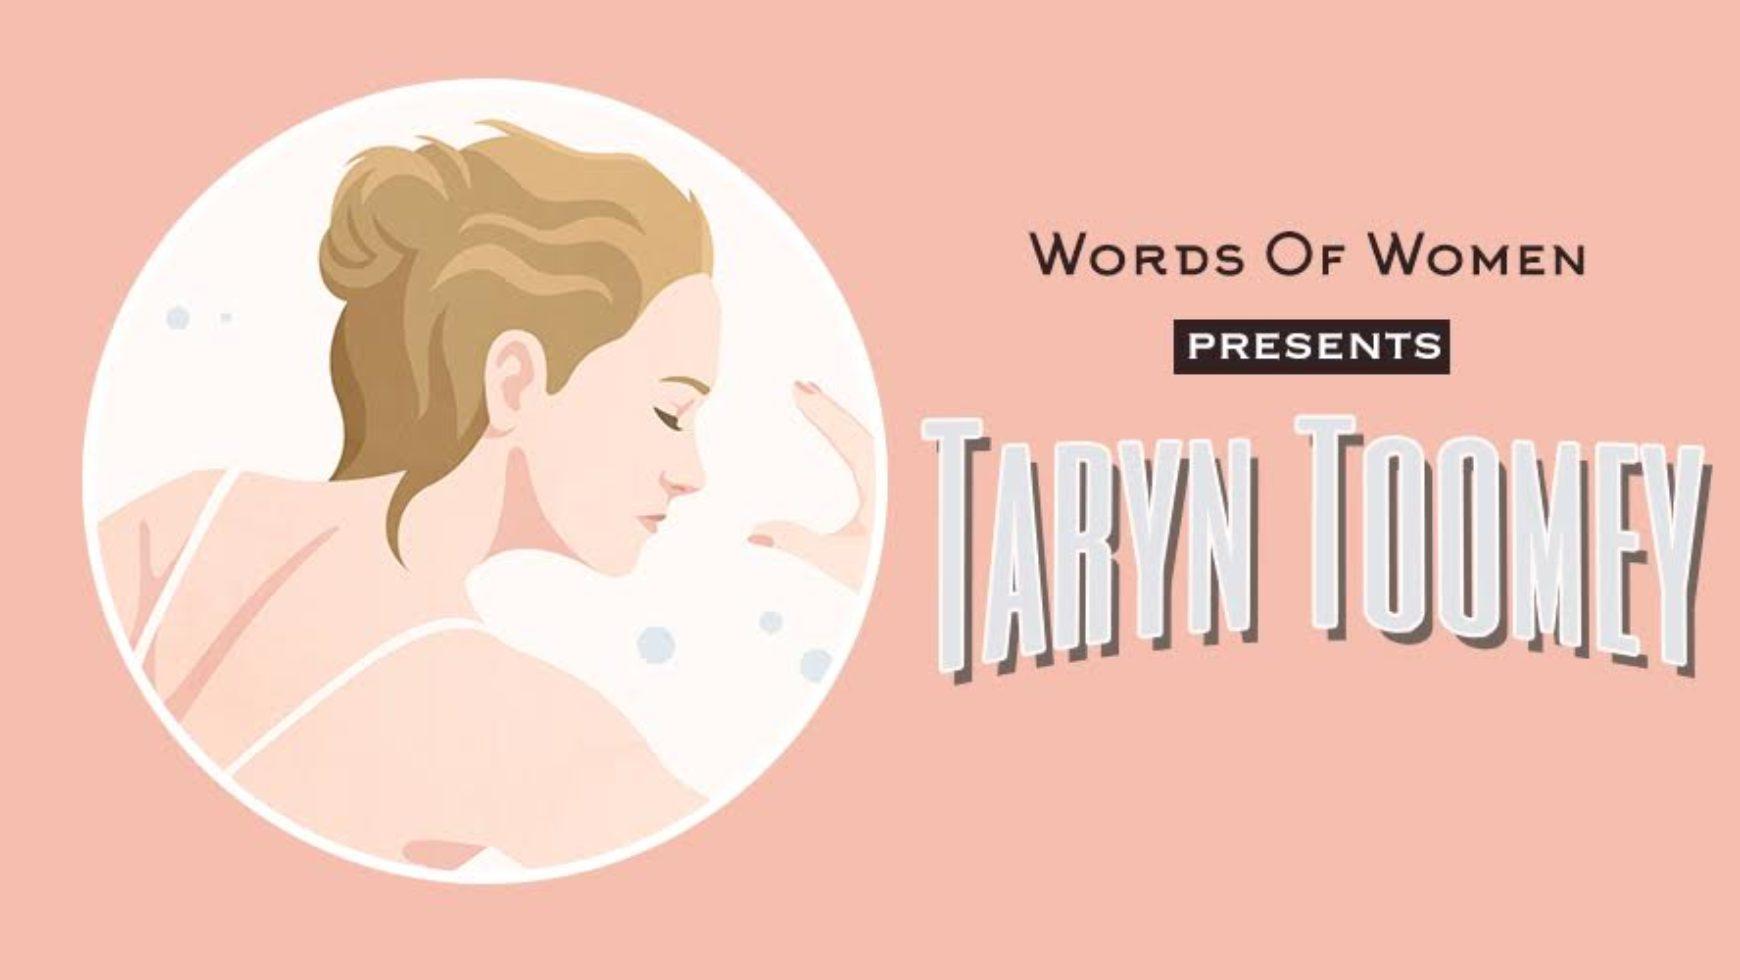 Inside The Mind Of: Taryn Toomey